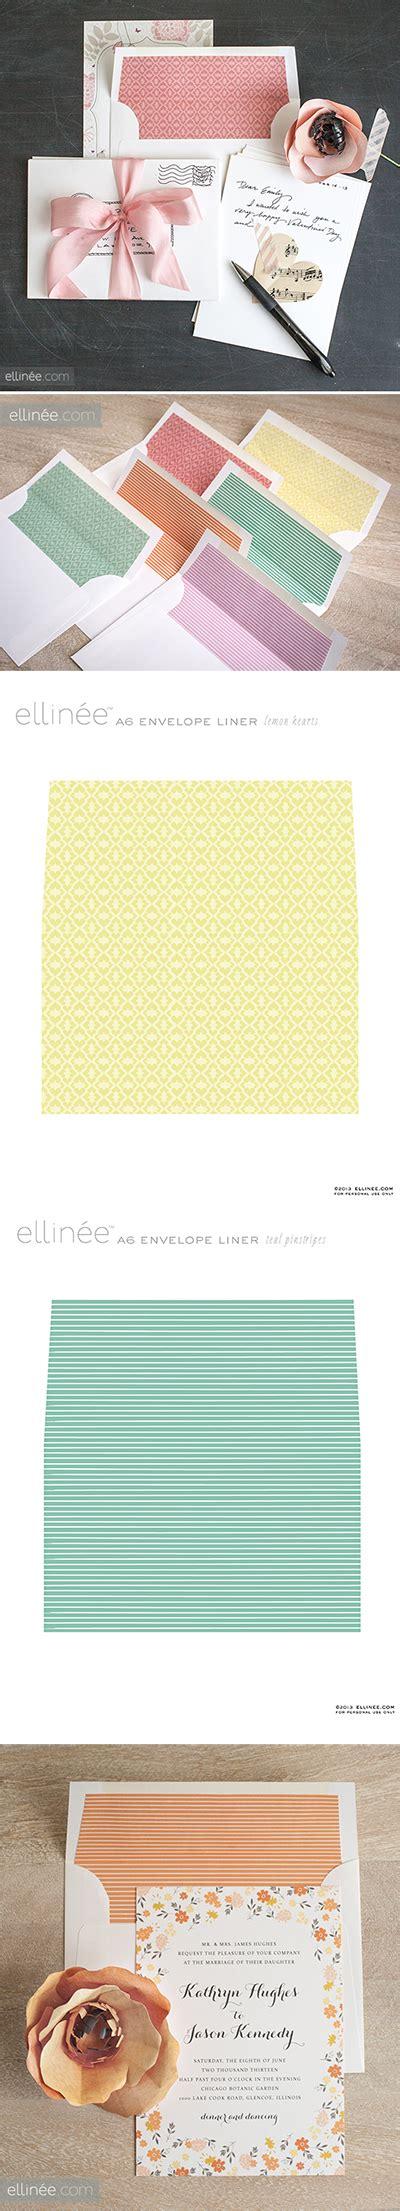 patterned envelope liners free printable stripe heart patterned envelope liners